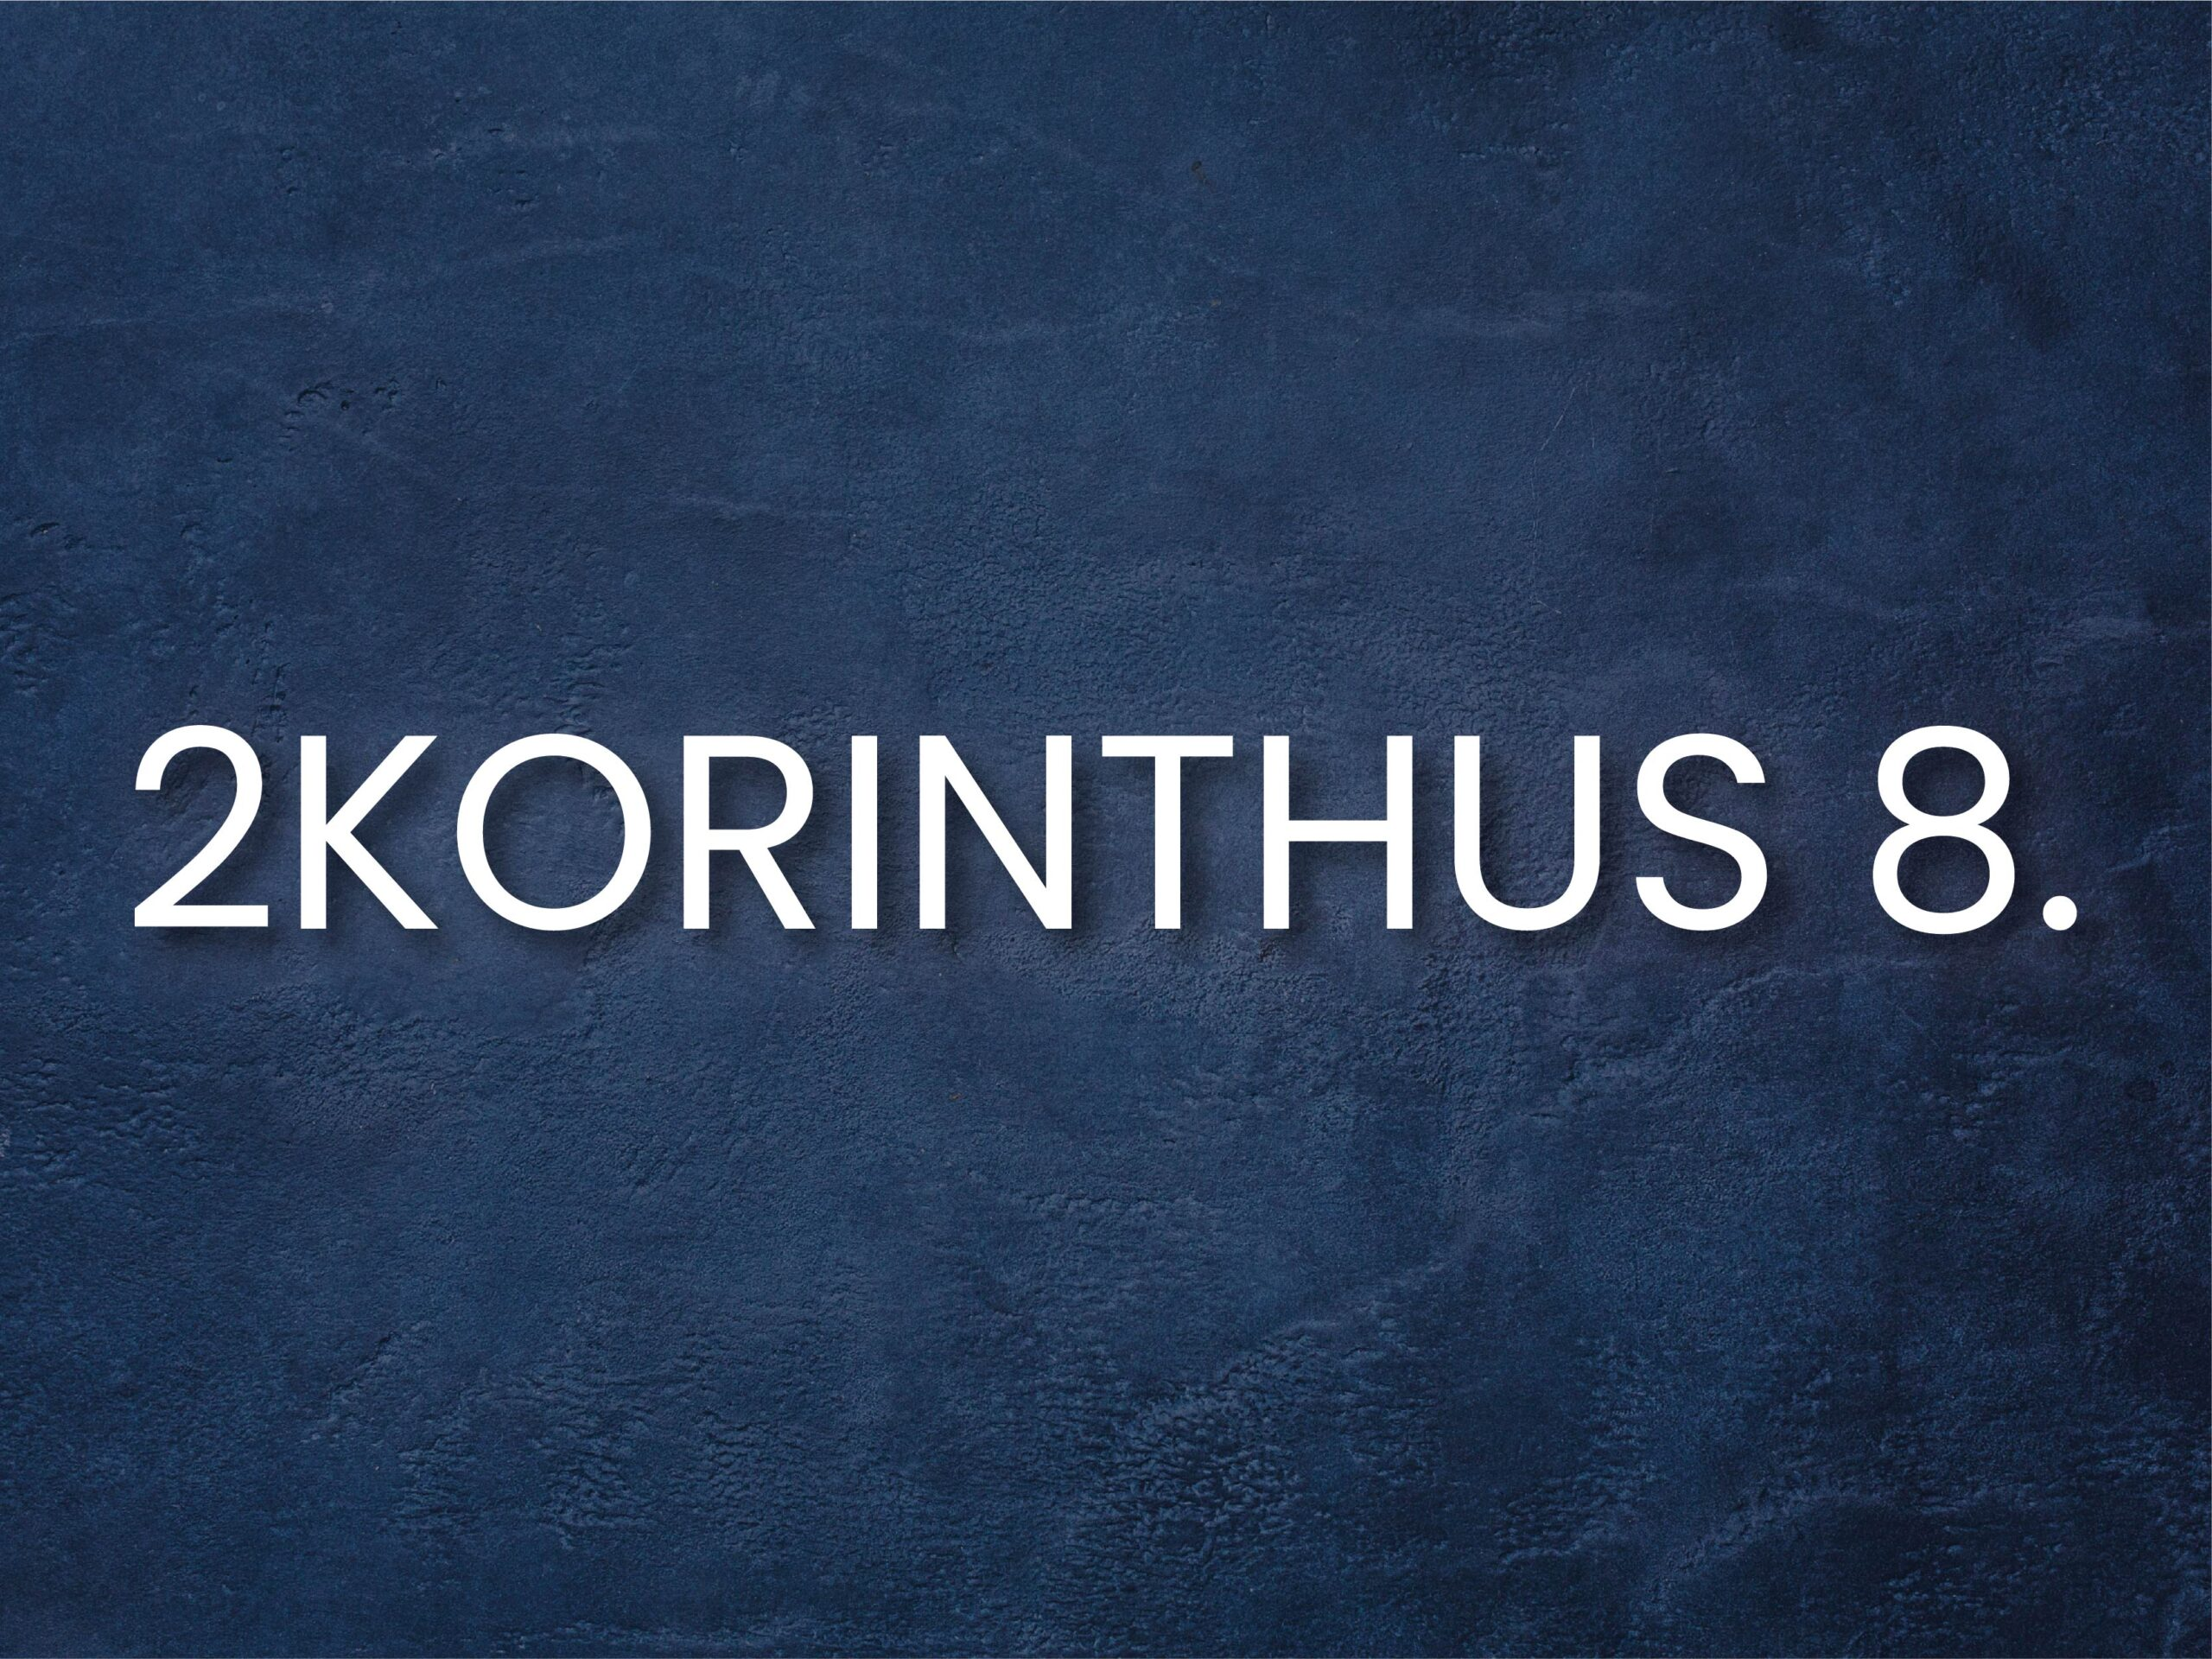 INFO_2korinthus_8